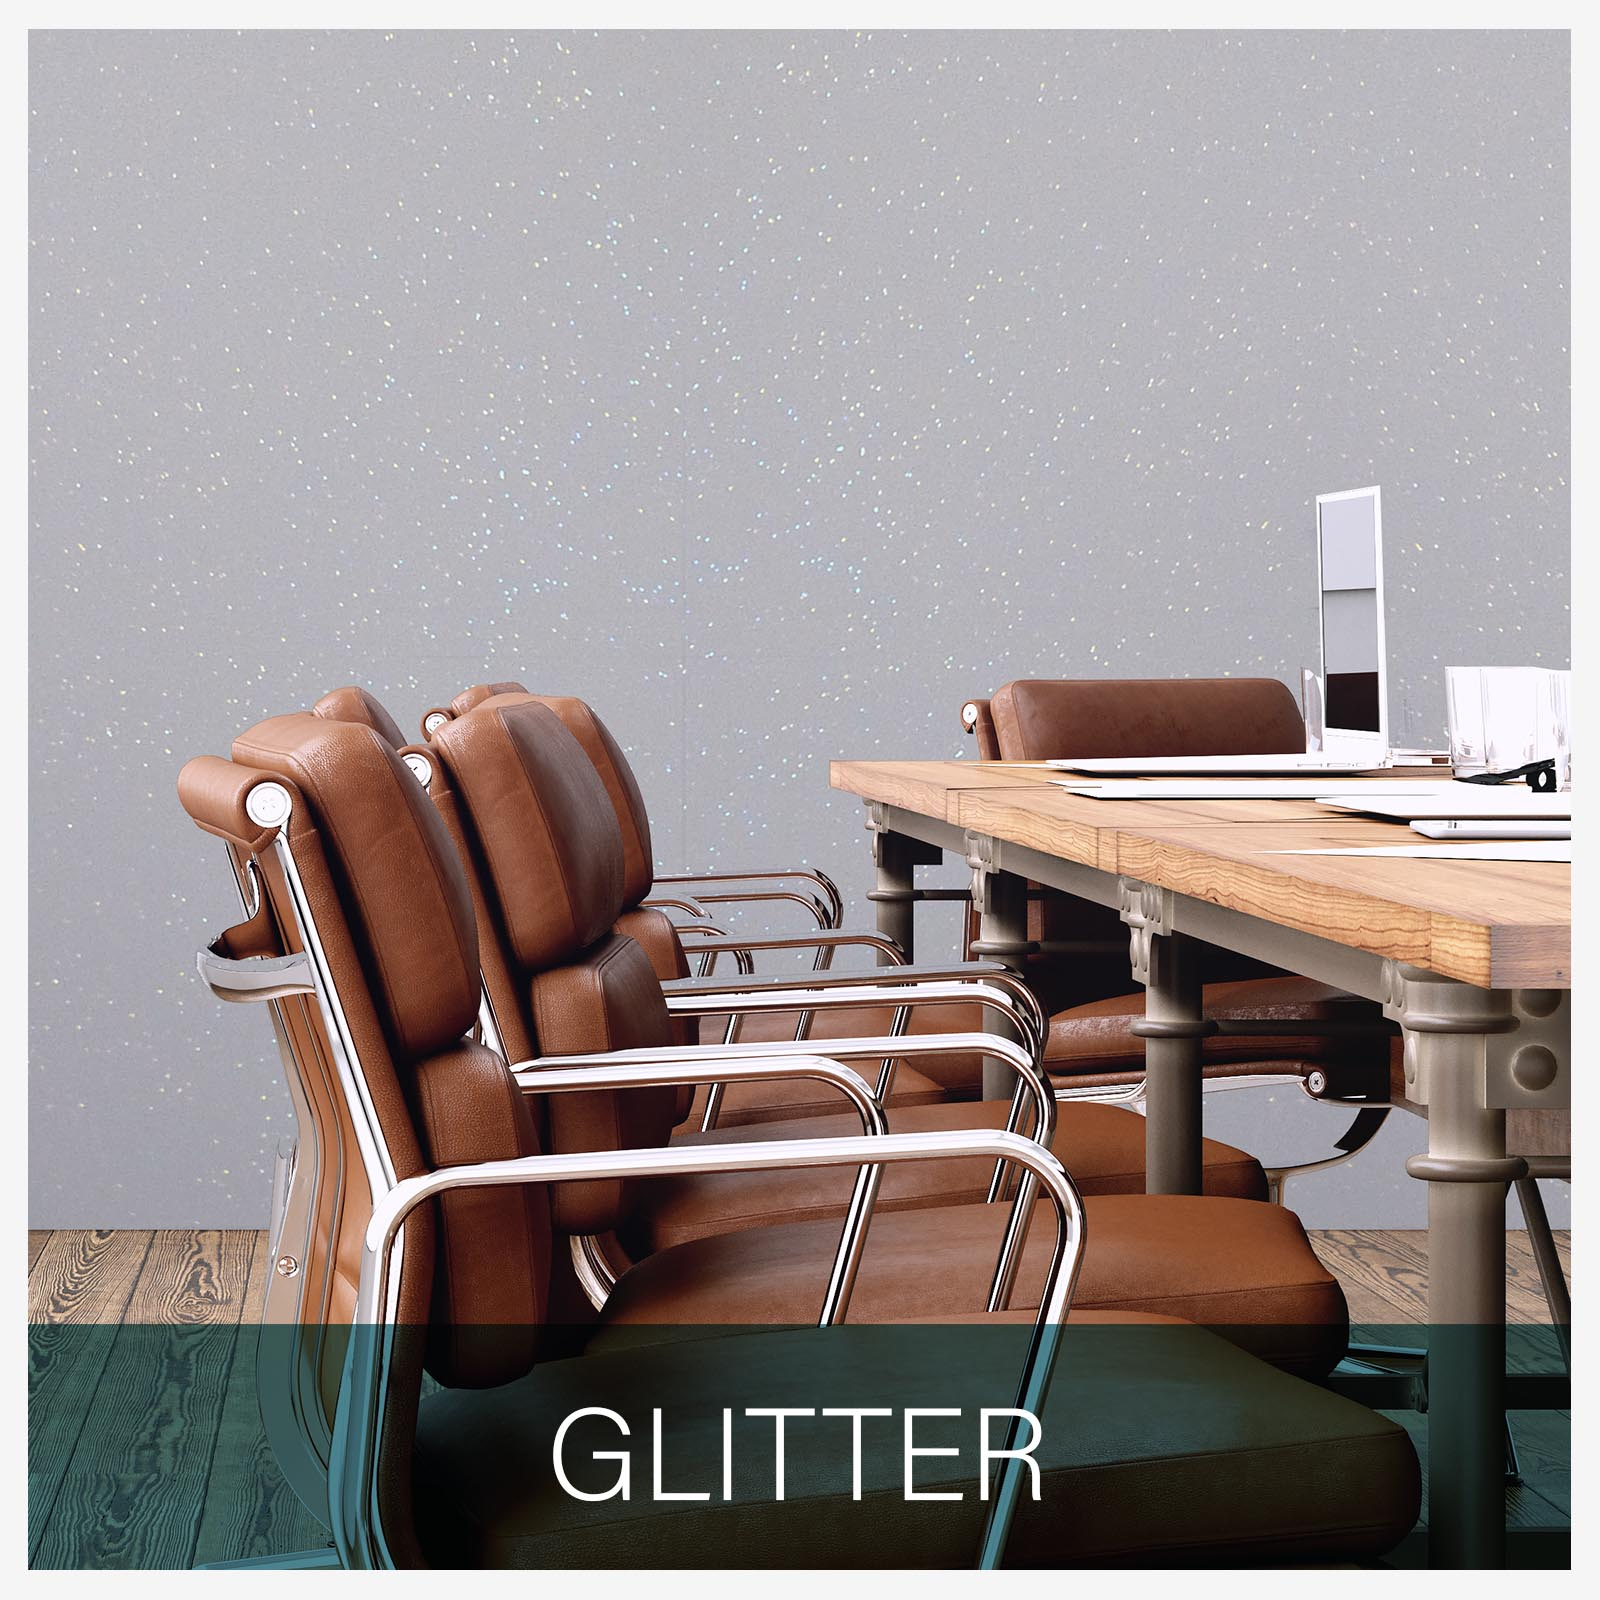 glitter-tekst